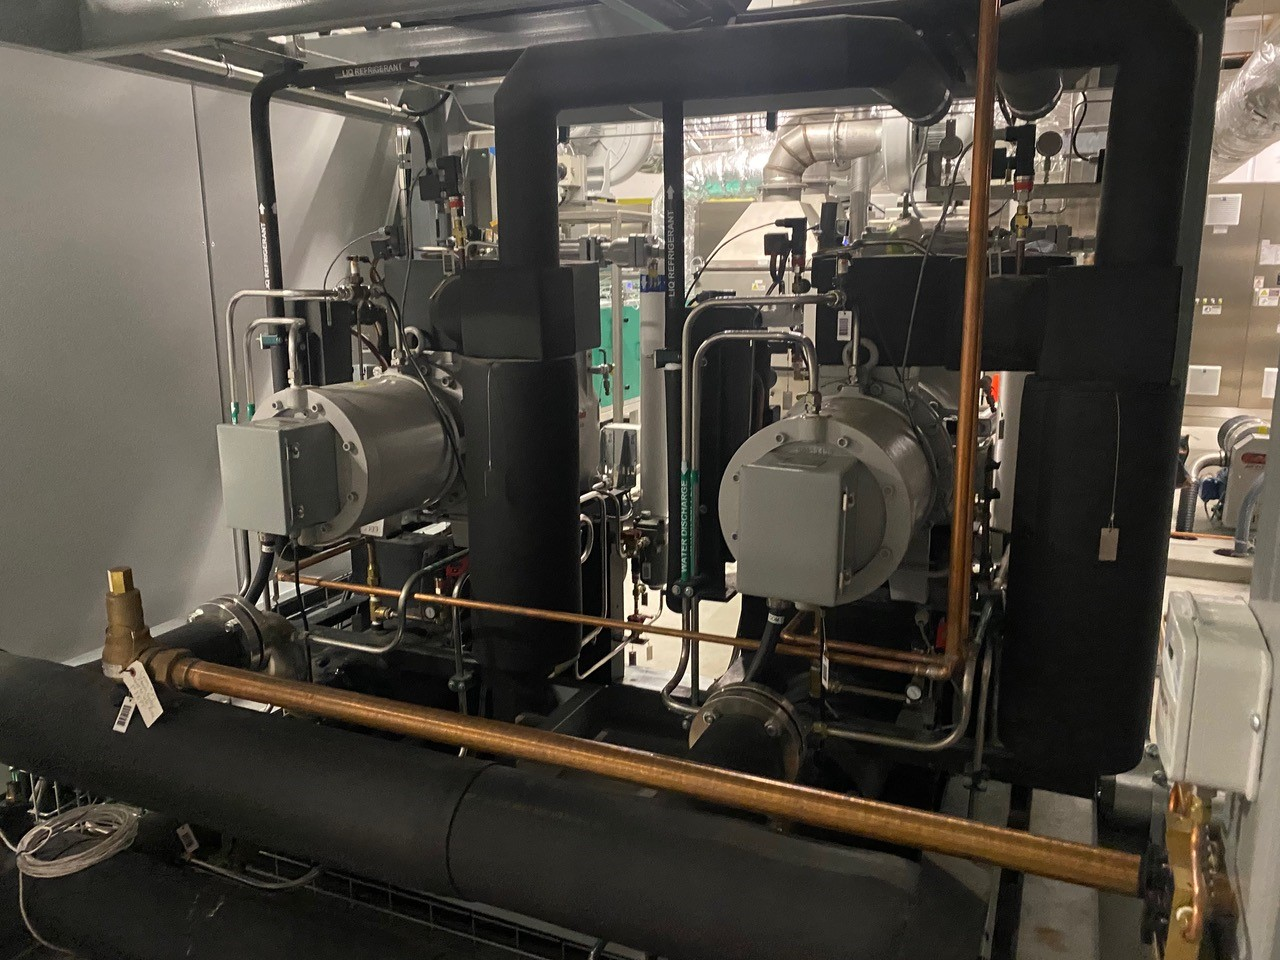 53.5 Sq Ft (5 Sq Meter) IMA Life Freeze Dryer Lyophilizer, Model Lyomax 5, Unused